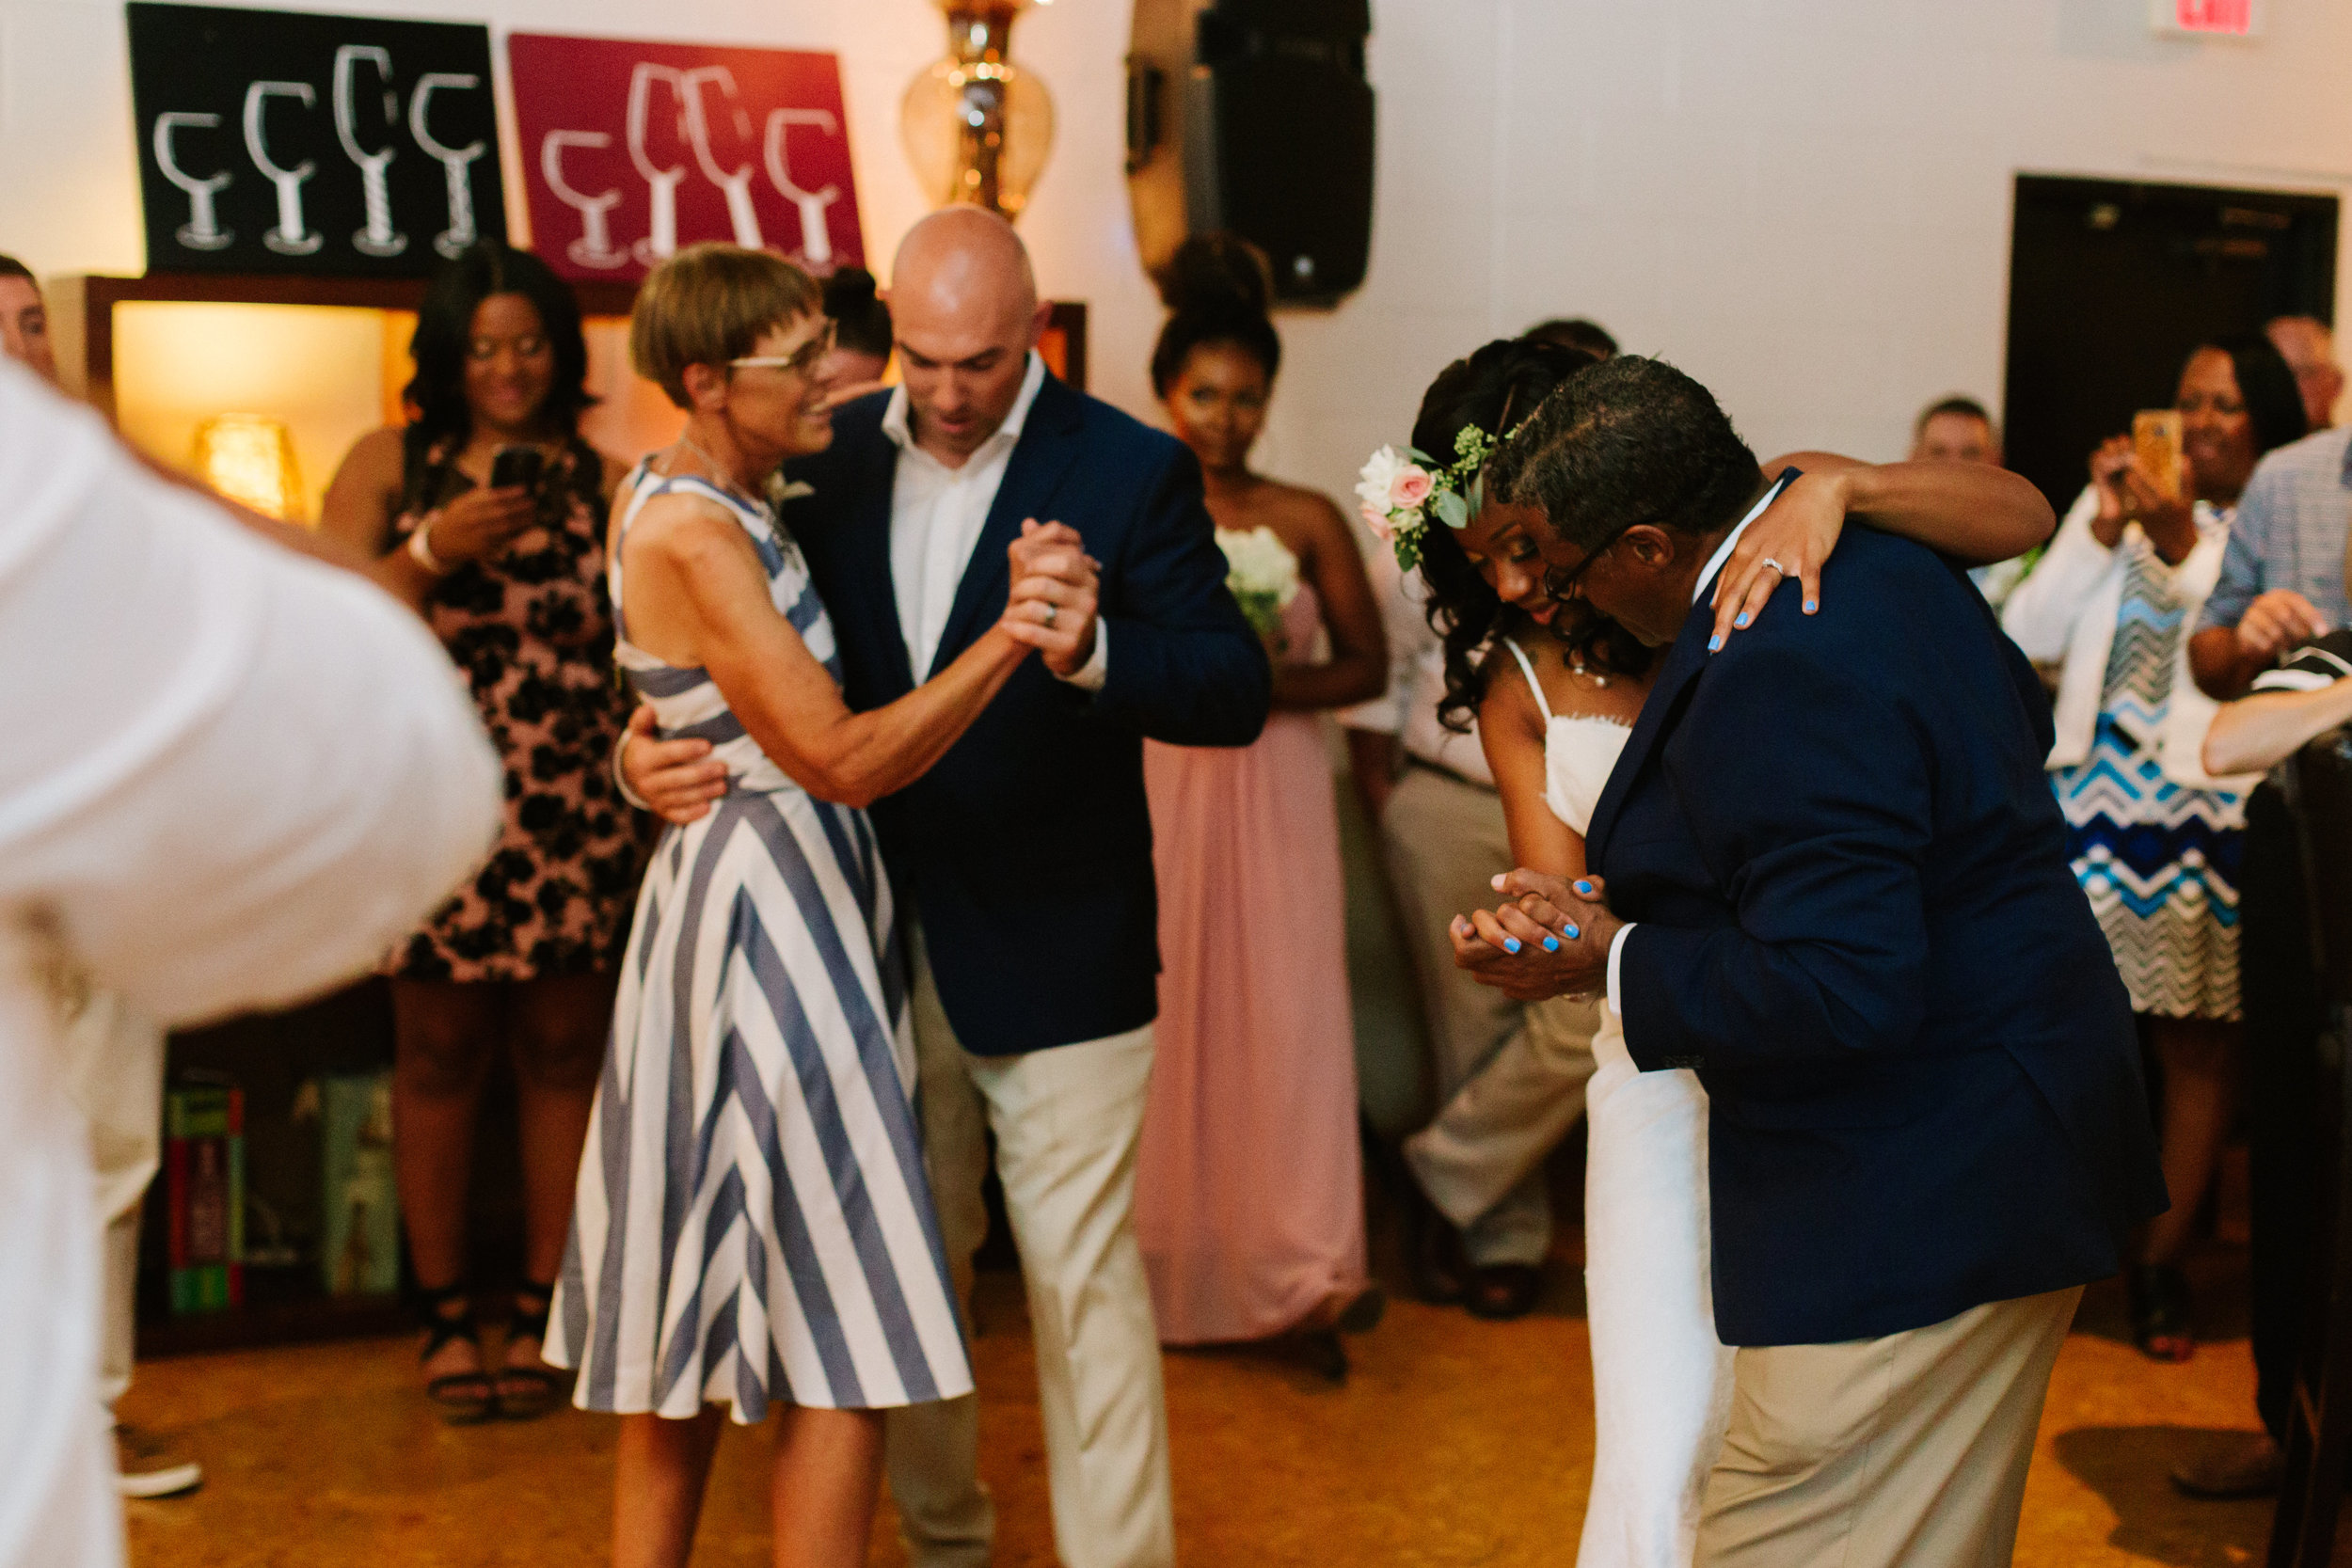 2017.09.16 Ashley and Chuck O'Day Quantam Leap Winery Wedding (338 of 462).jpg